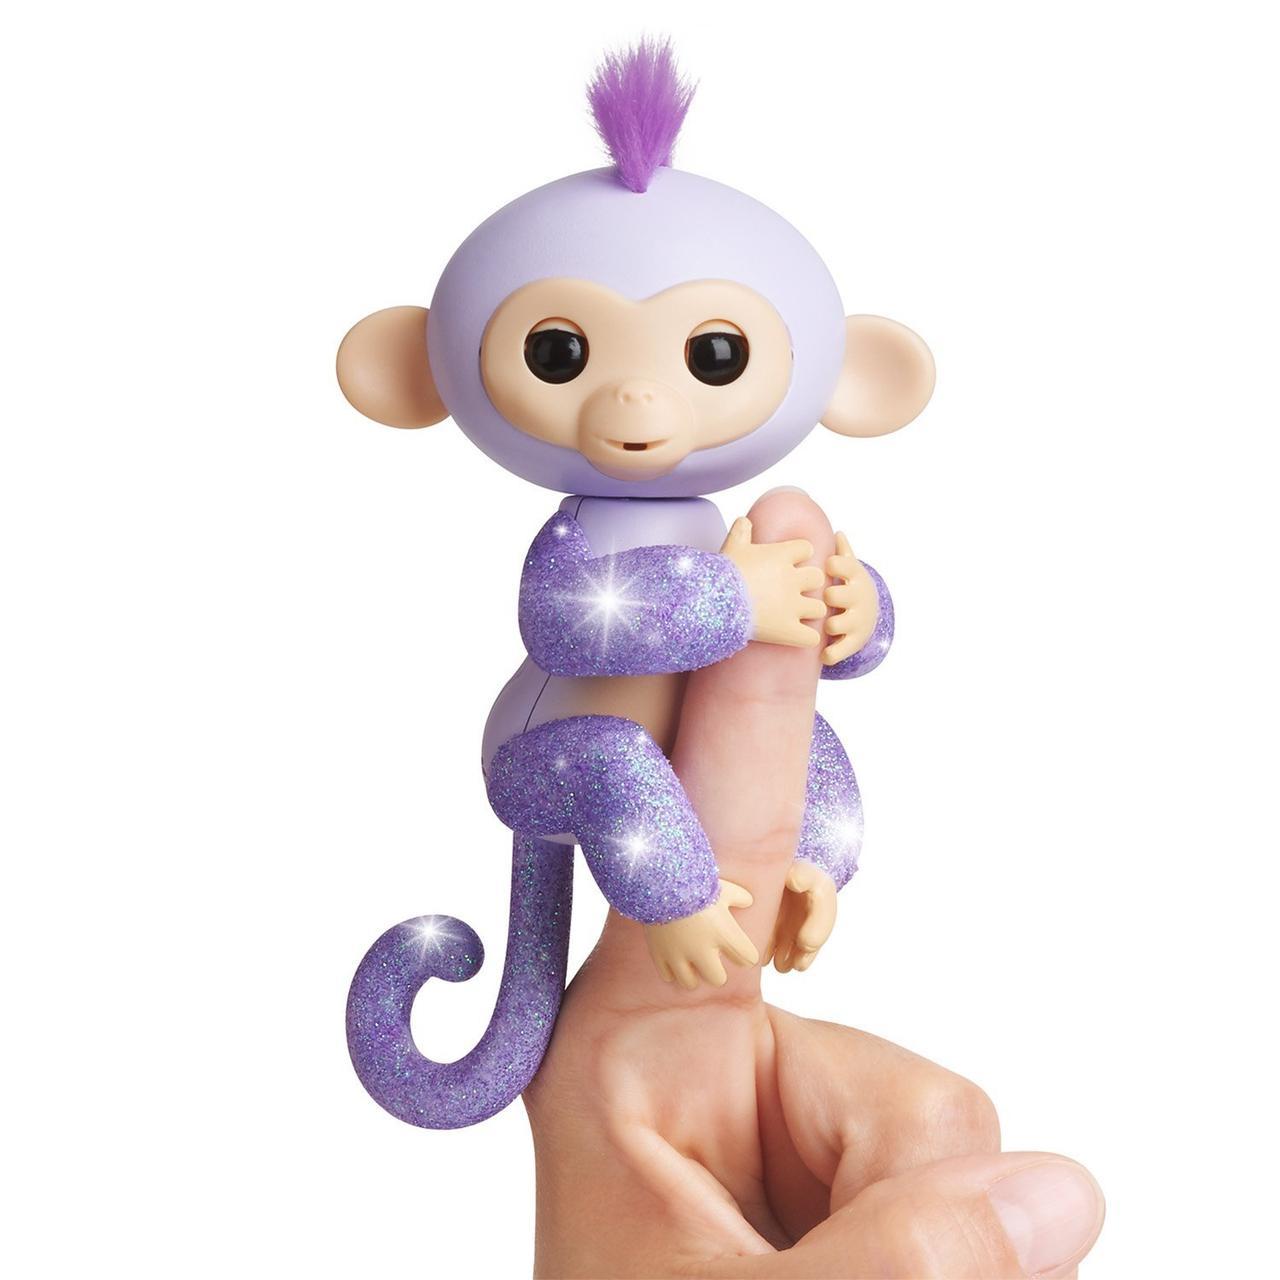 Интерактивная обезьянка WowWee Fingerlings оригинал!